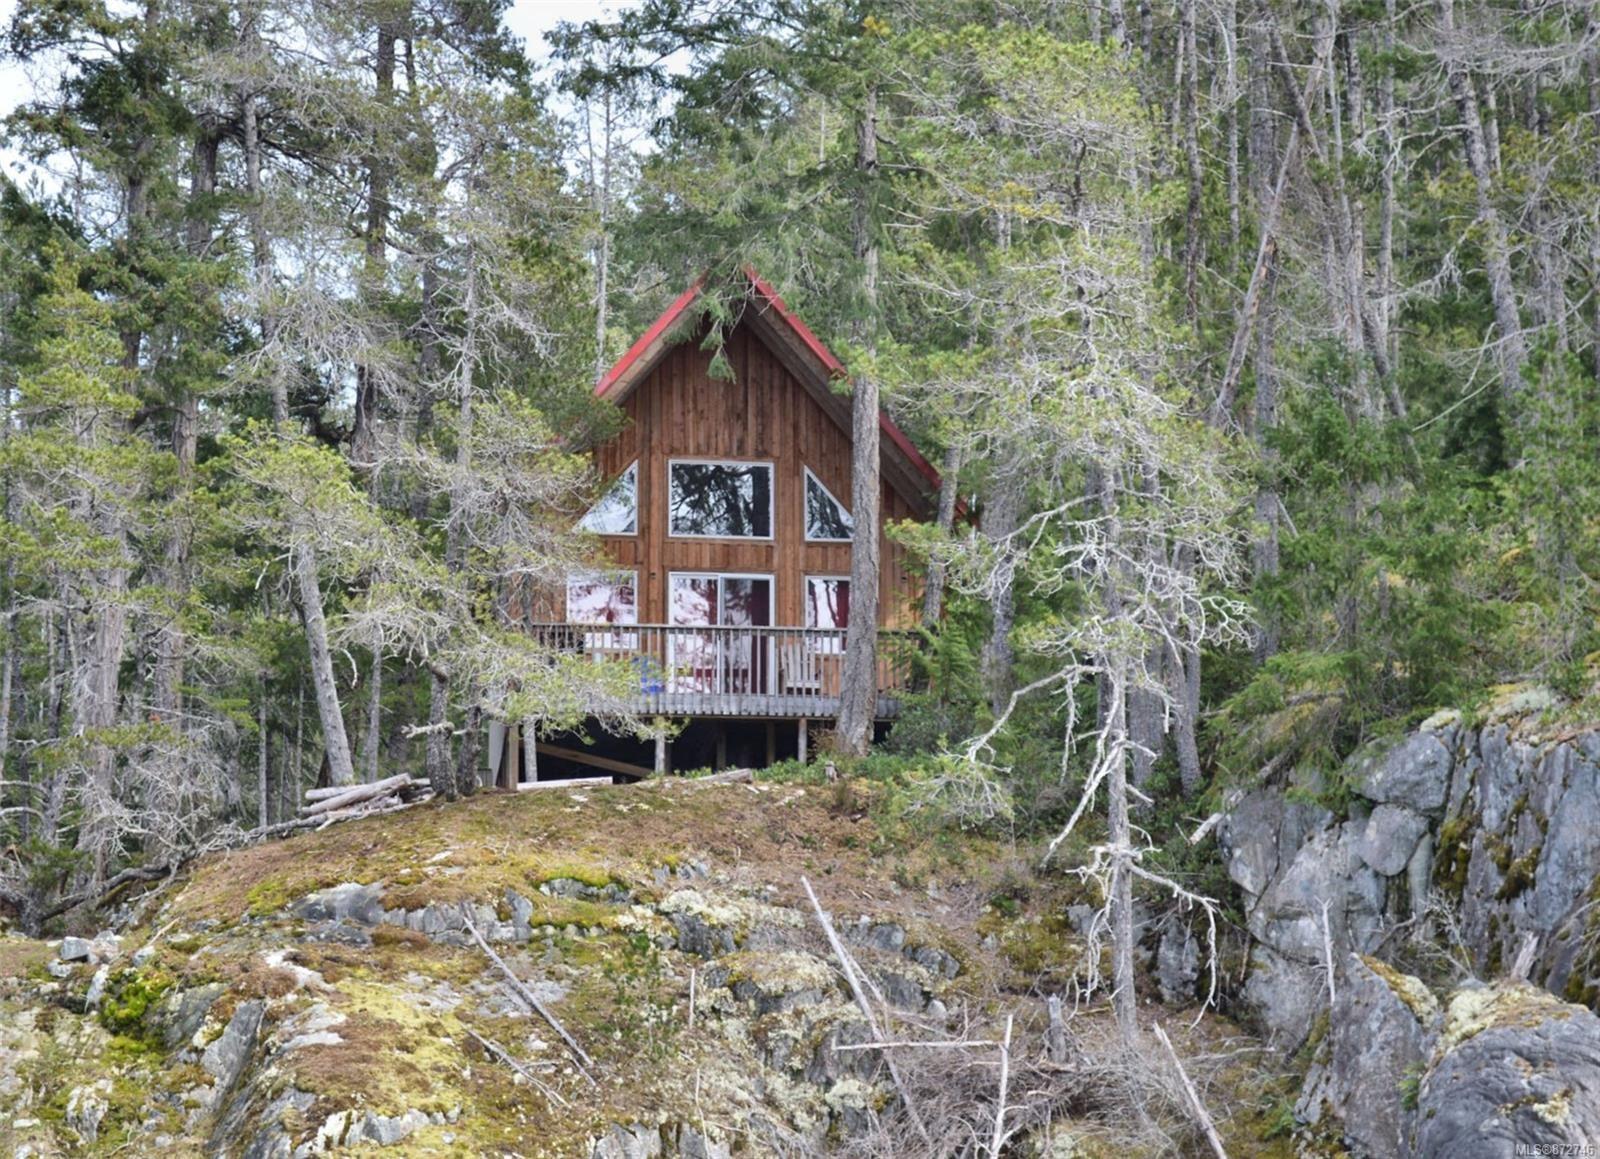 Main Photo: SL3 Read Island in : Isl Read Island House for sale (Islands)  : MLS®# 872746